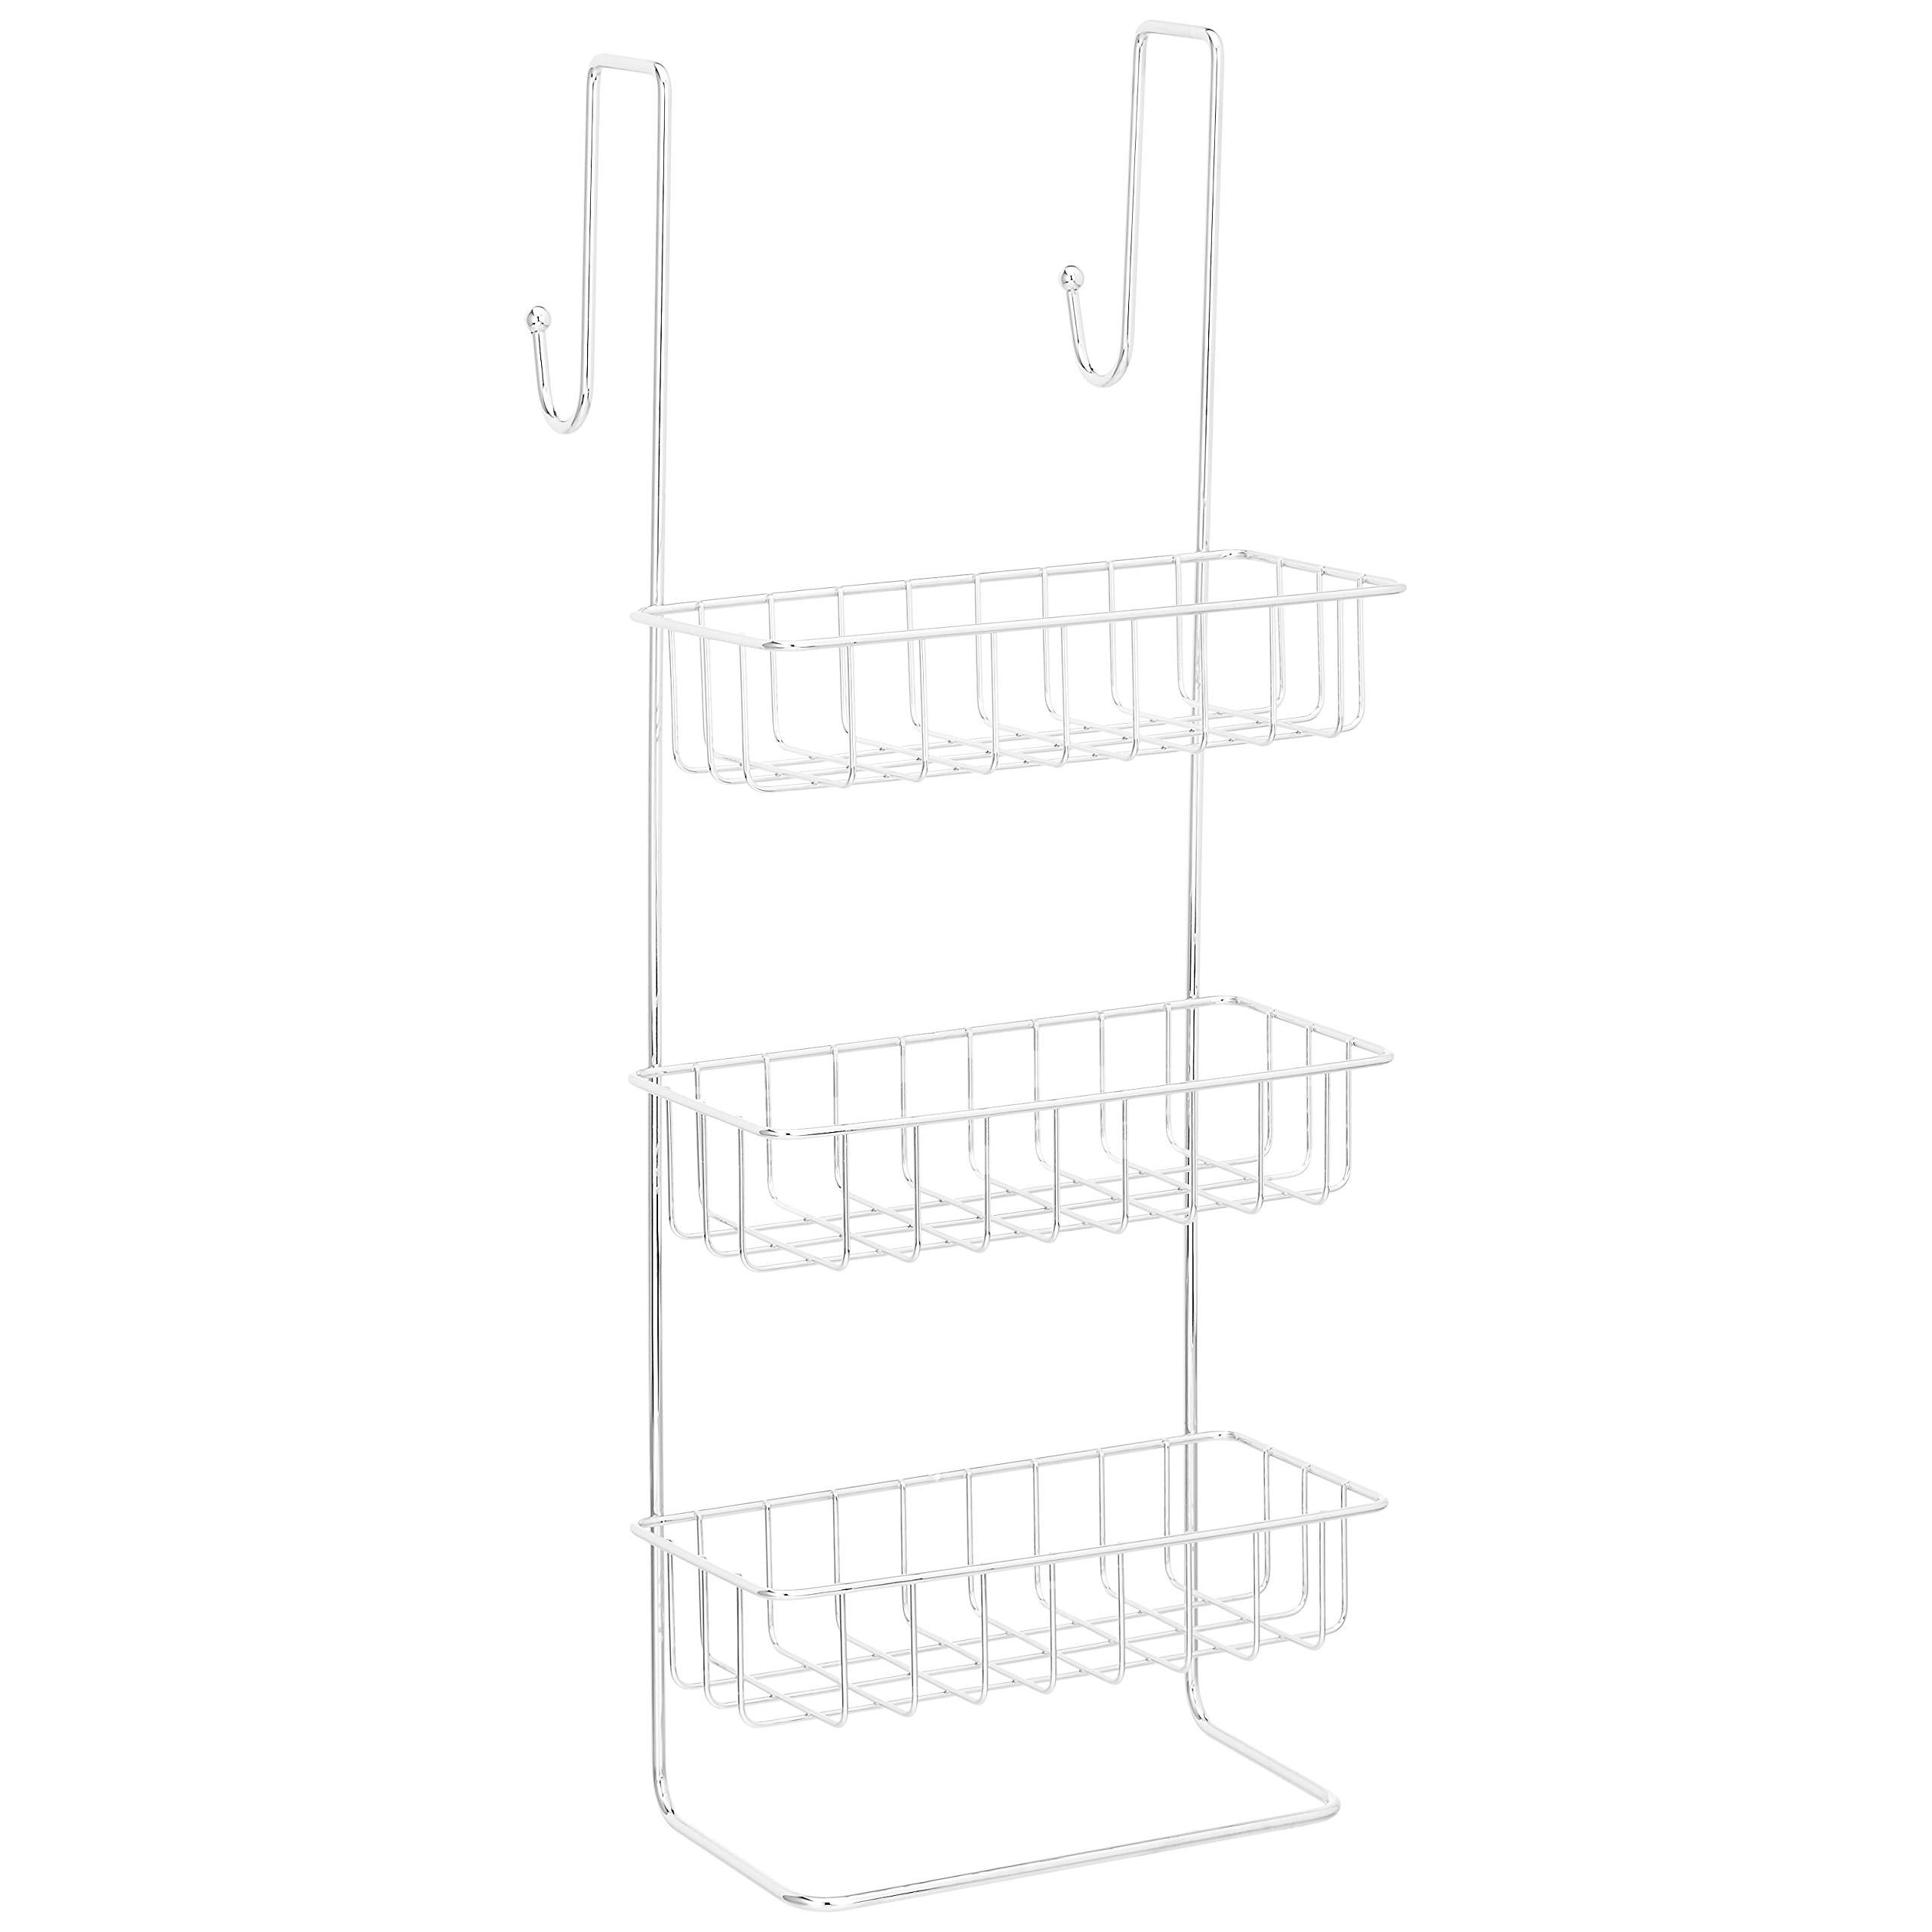 AmazonBasics 3-Tier Over Door Organizer by AmazonBasics